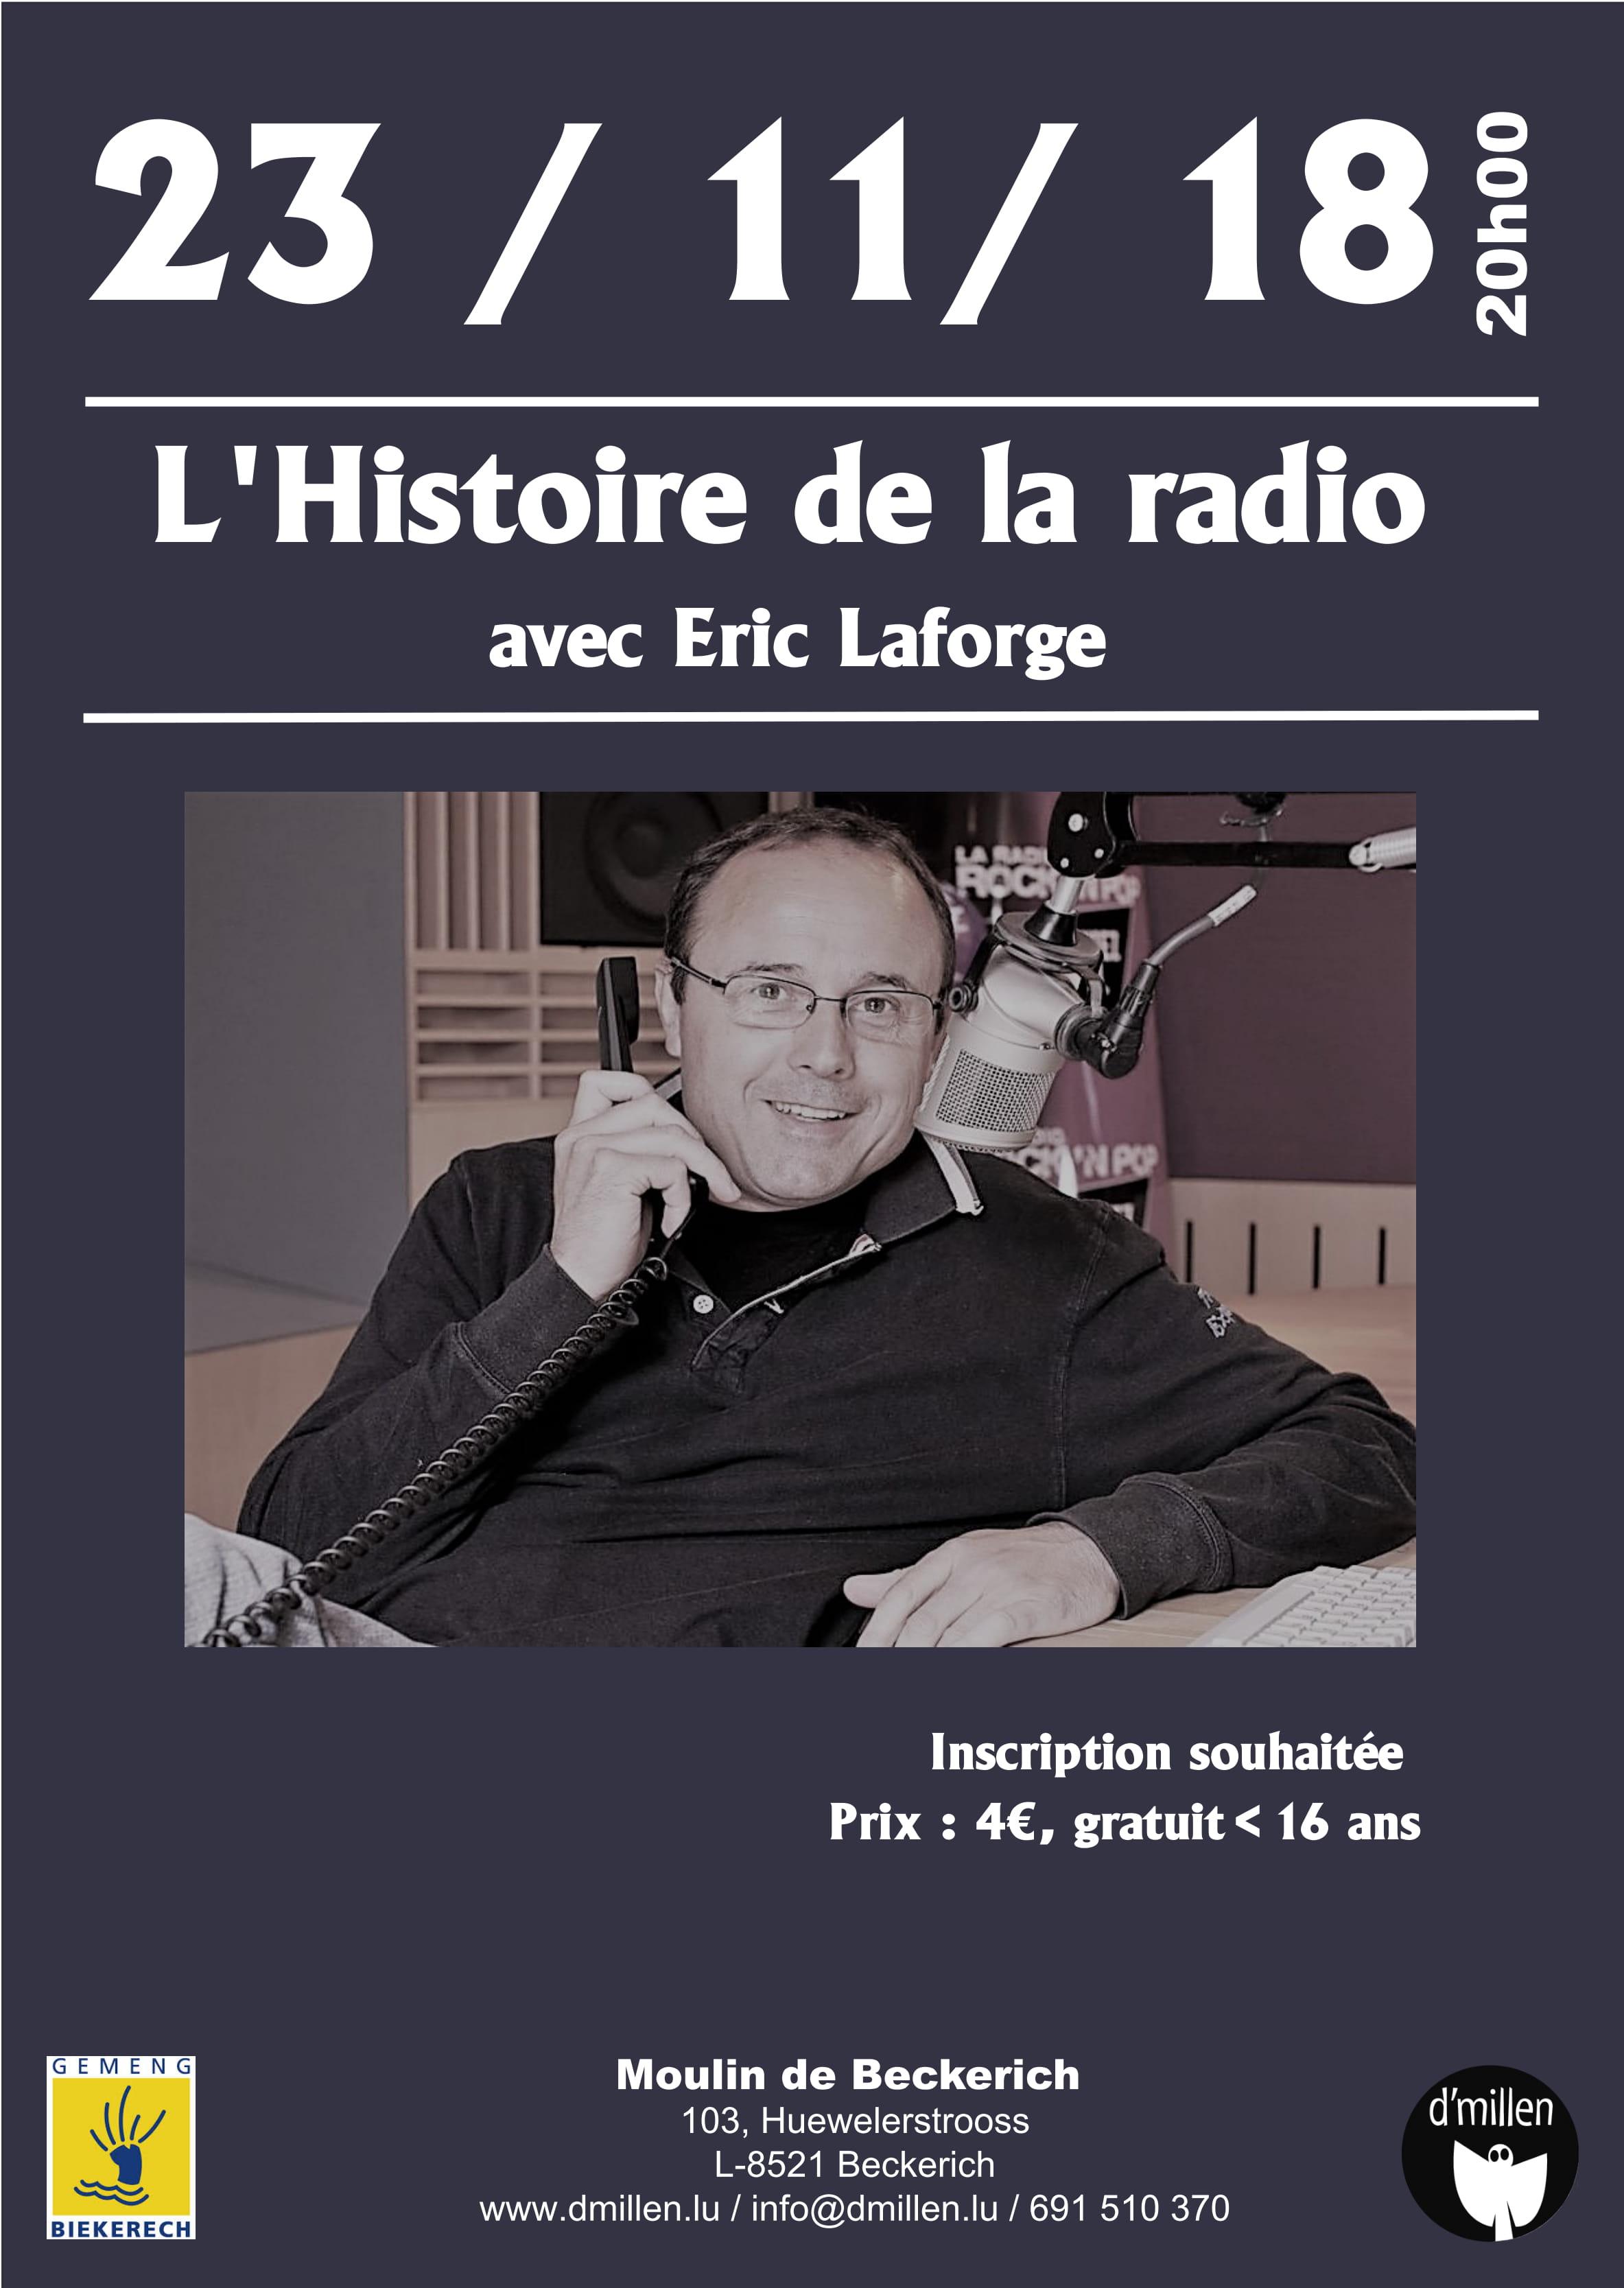 Affiche Eric Laforge-23-11-bd-1.jpg